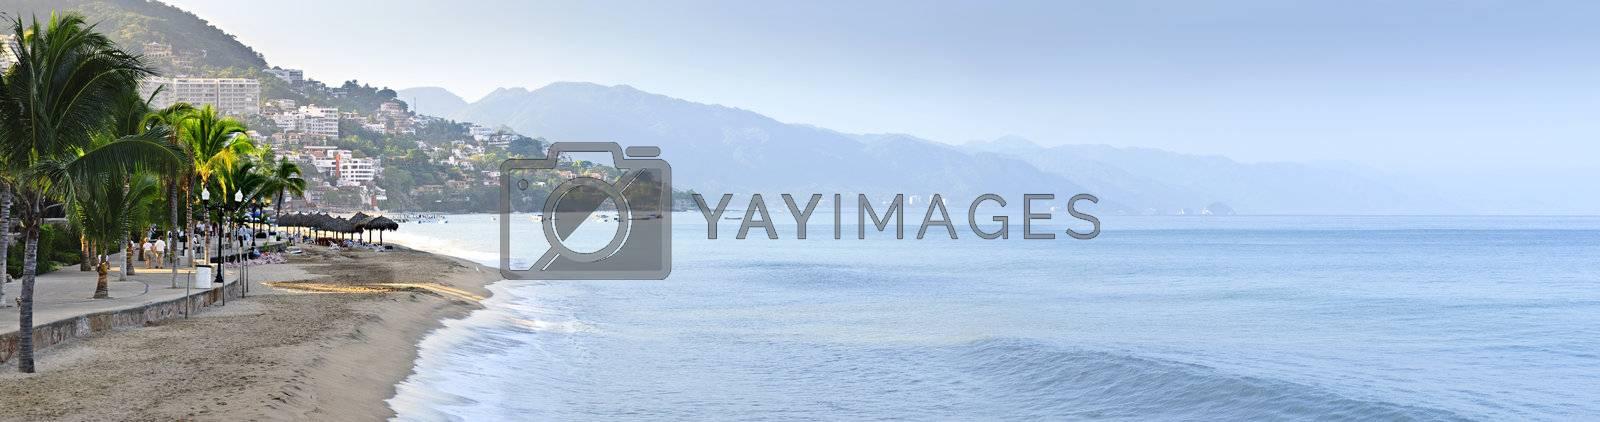 Panoramic image of beach and ocean in Puerto Vallarta, Mexico